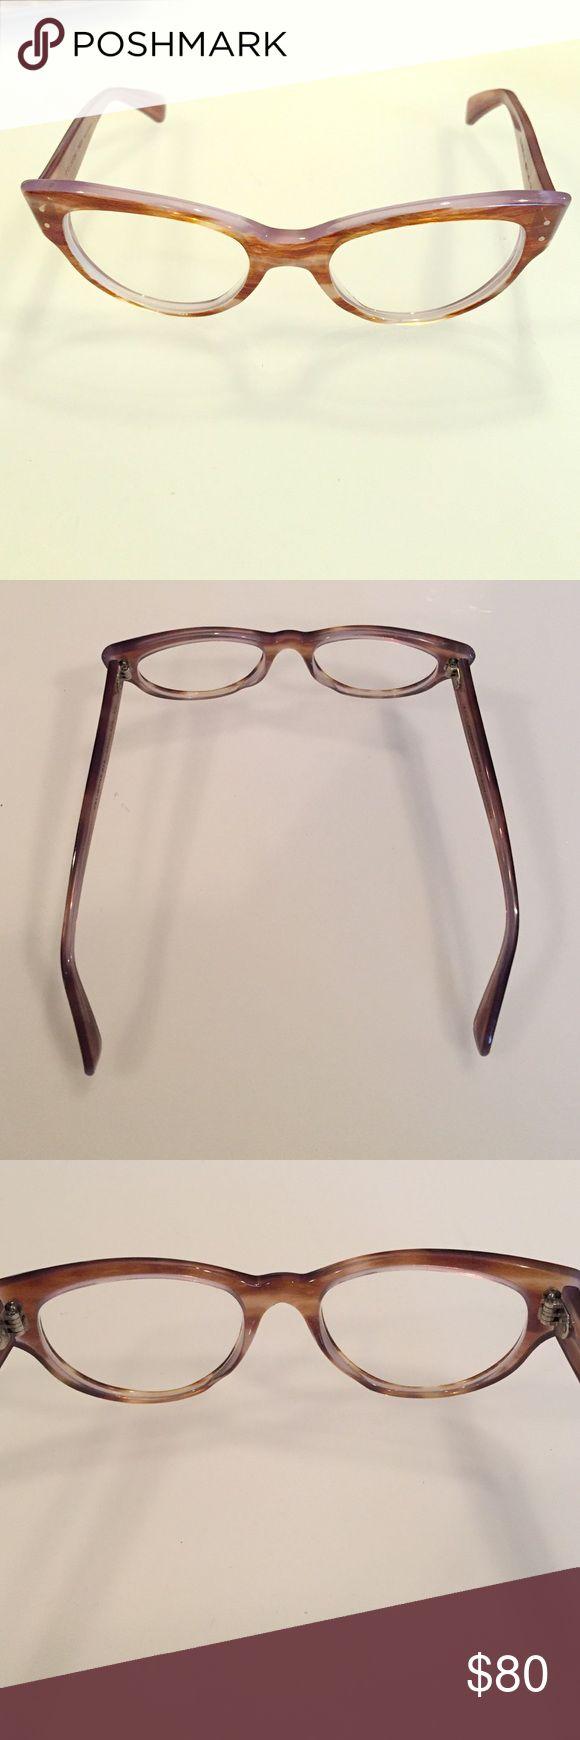 Jean lafont eyeglasses frames - Jean Lafont Cat Eye Glasses Retro Pinup